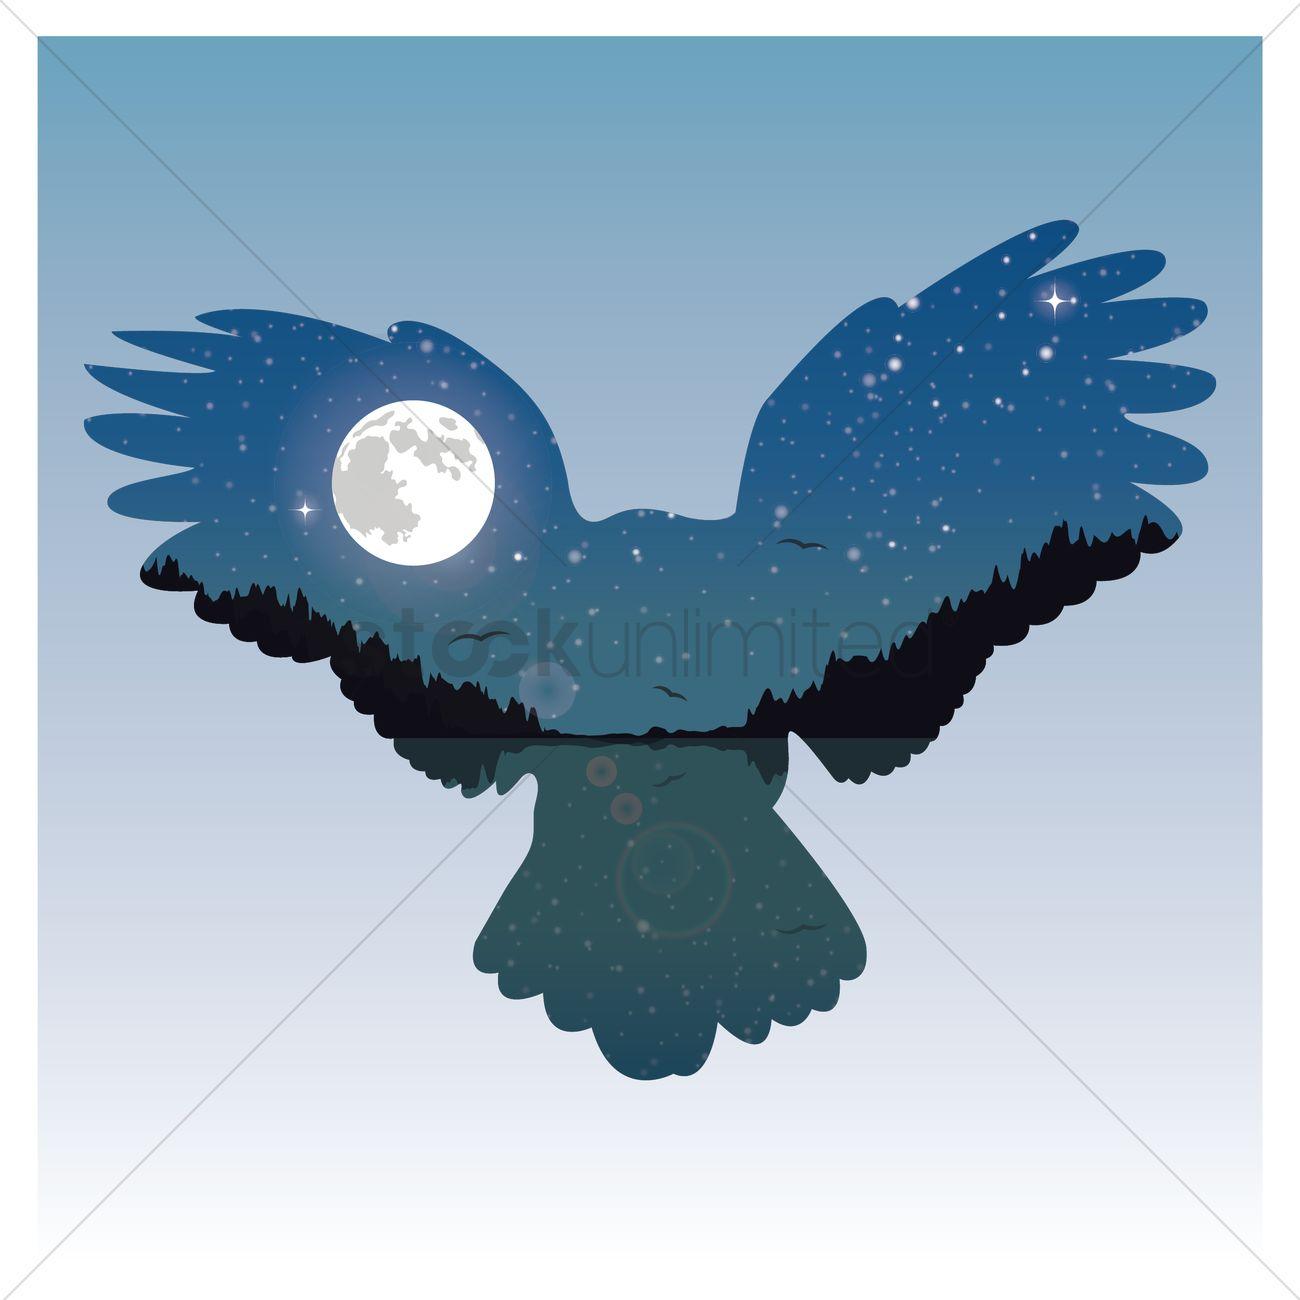 Double exposure bird and night sky Vector Image.